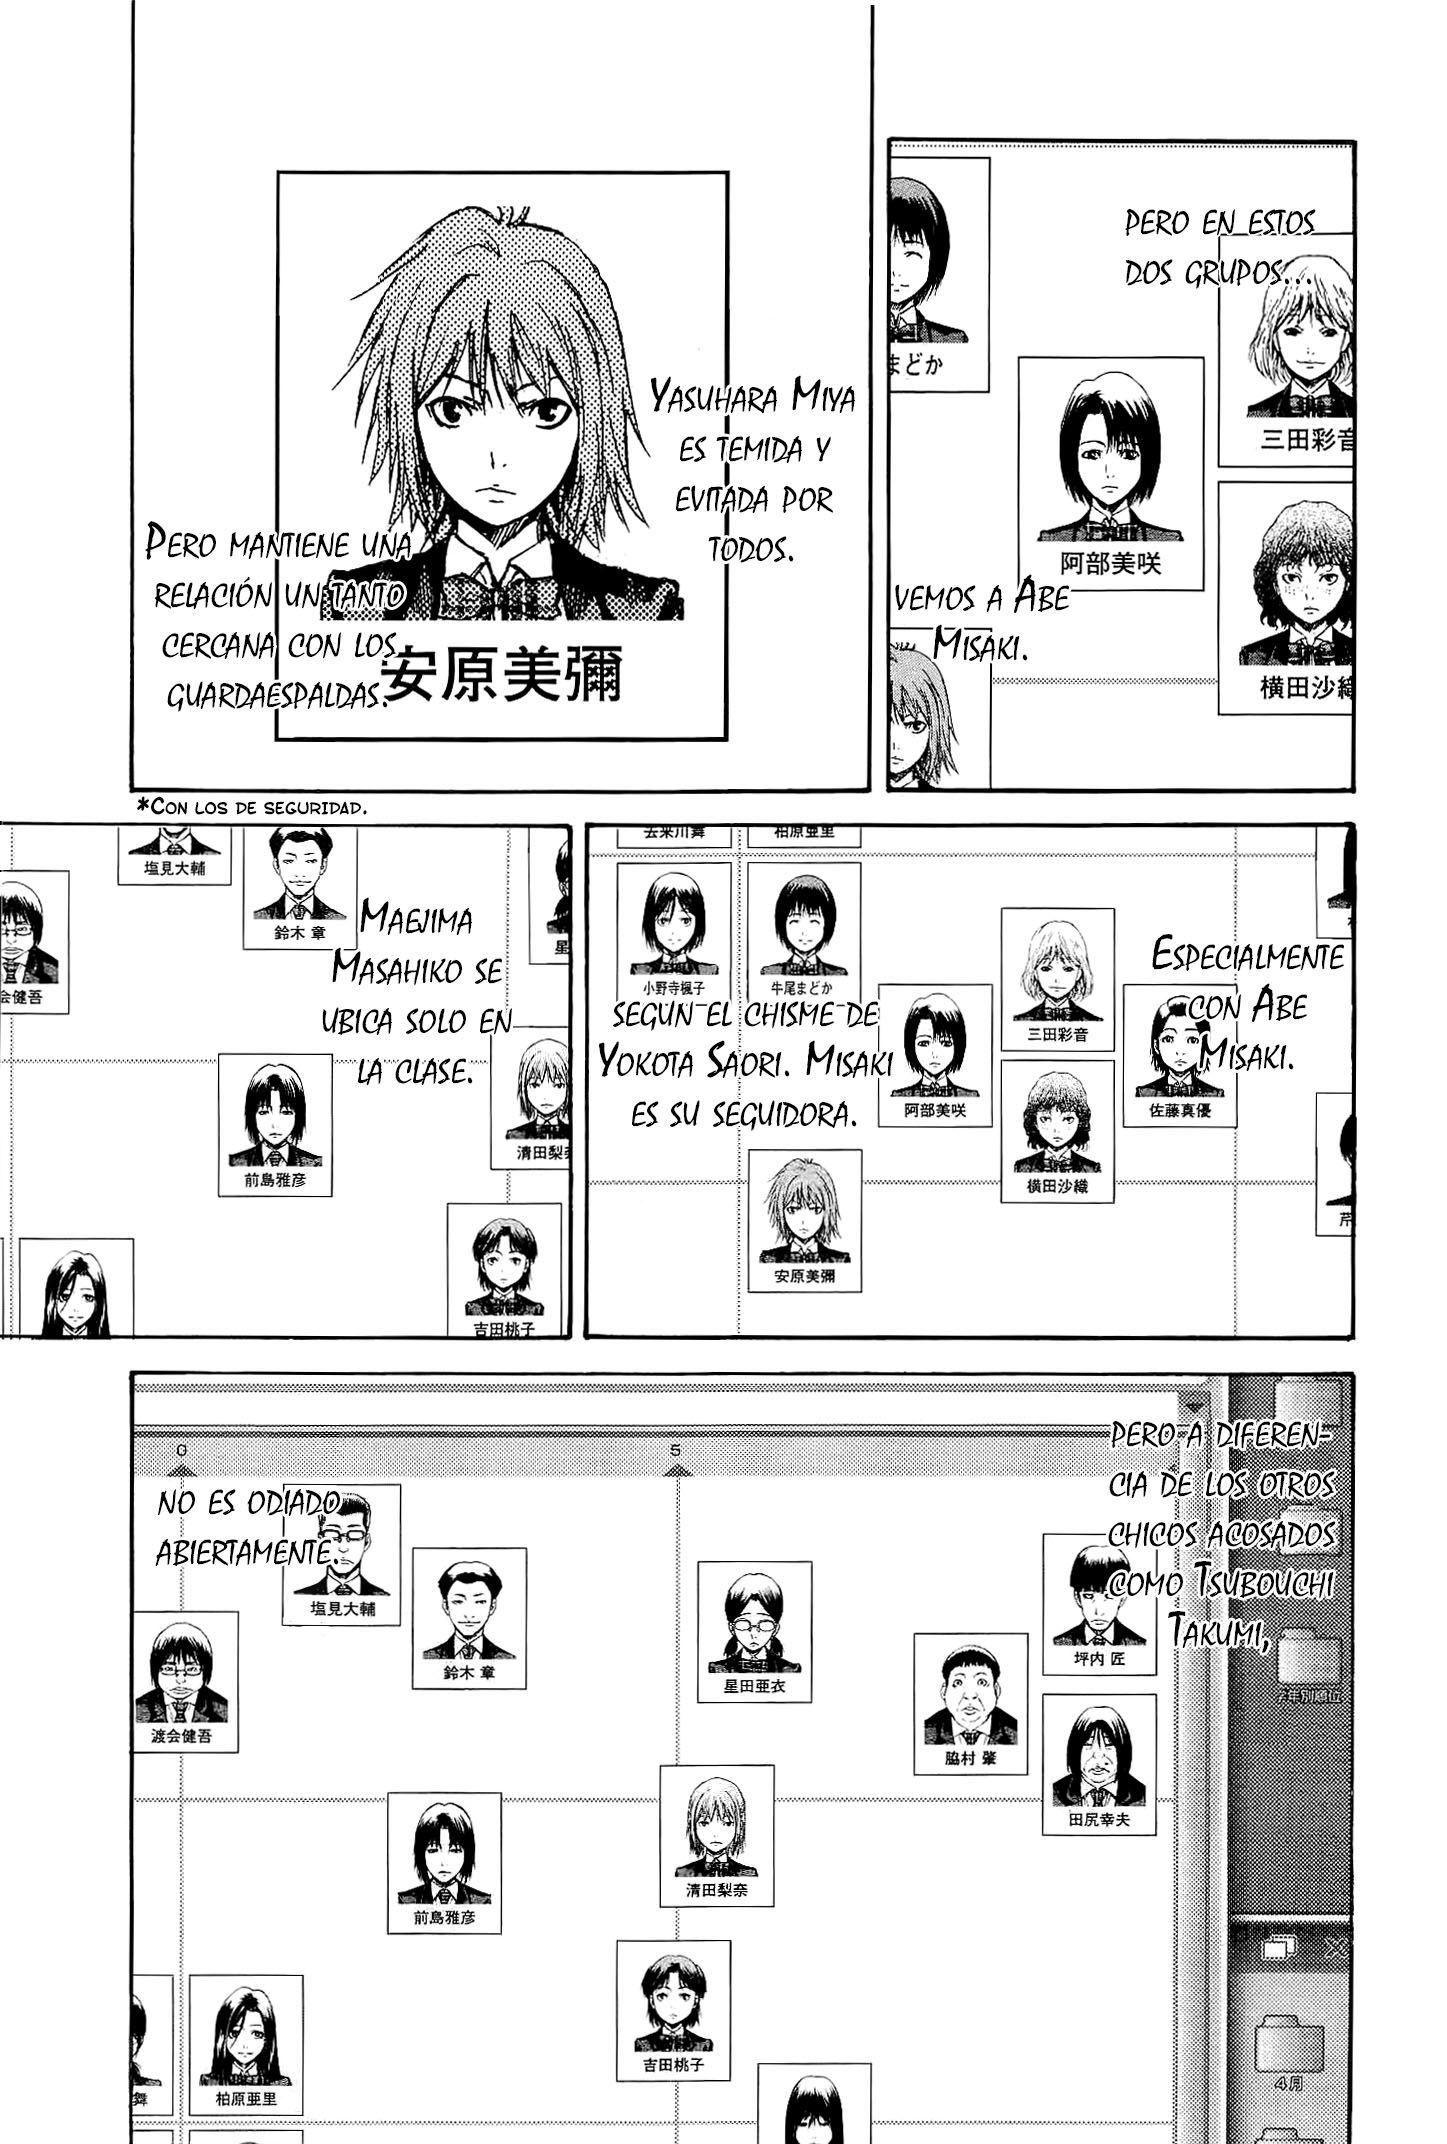 https://c5.ninemanga.com/es_manga/3/19523/468638/5fee73752ea487e464e6d547c7697f15.jpg Page 11